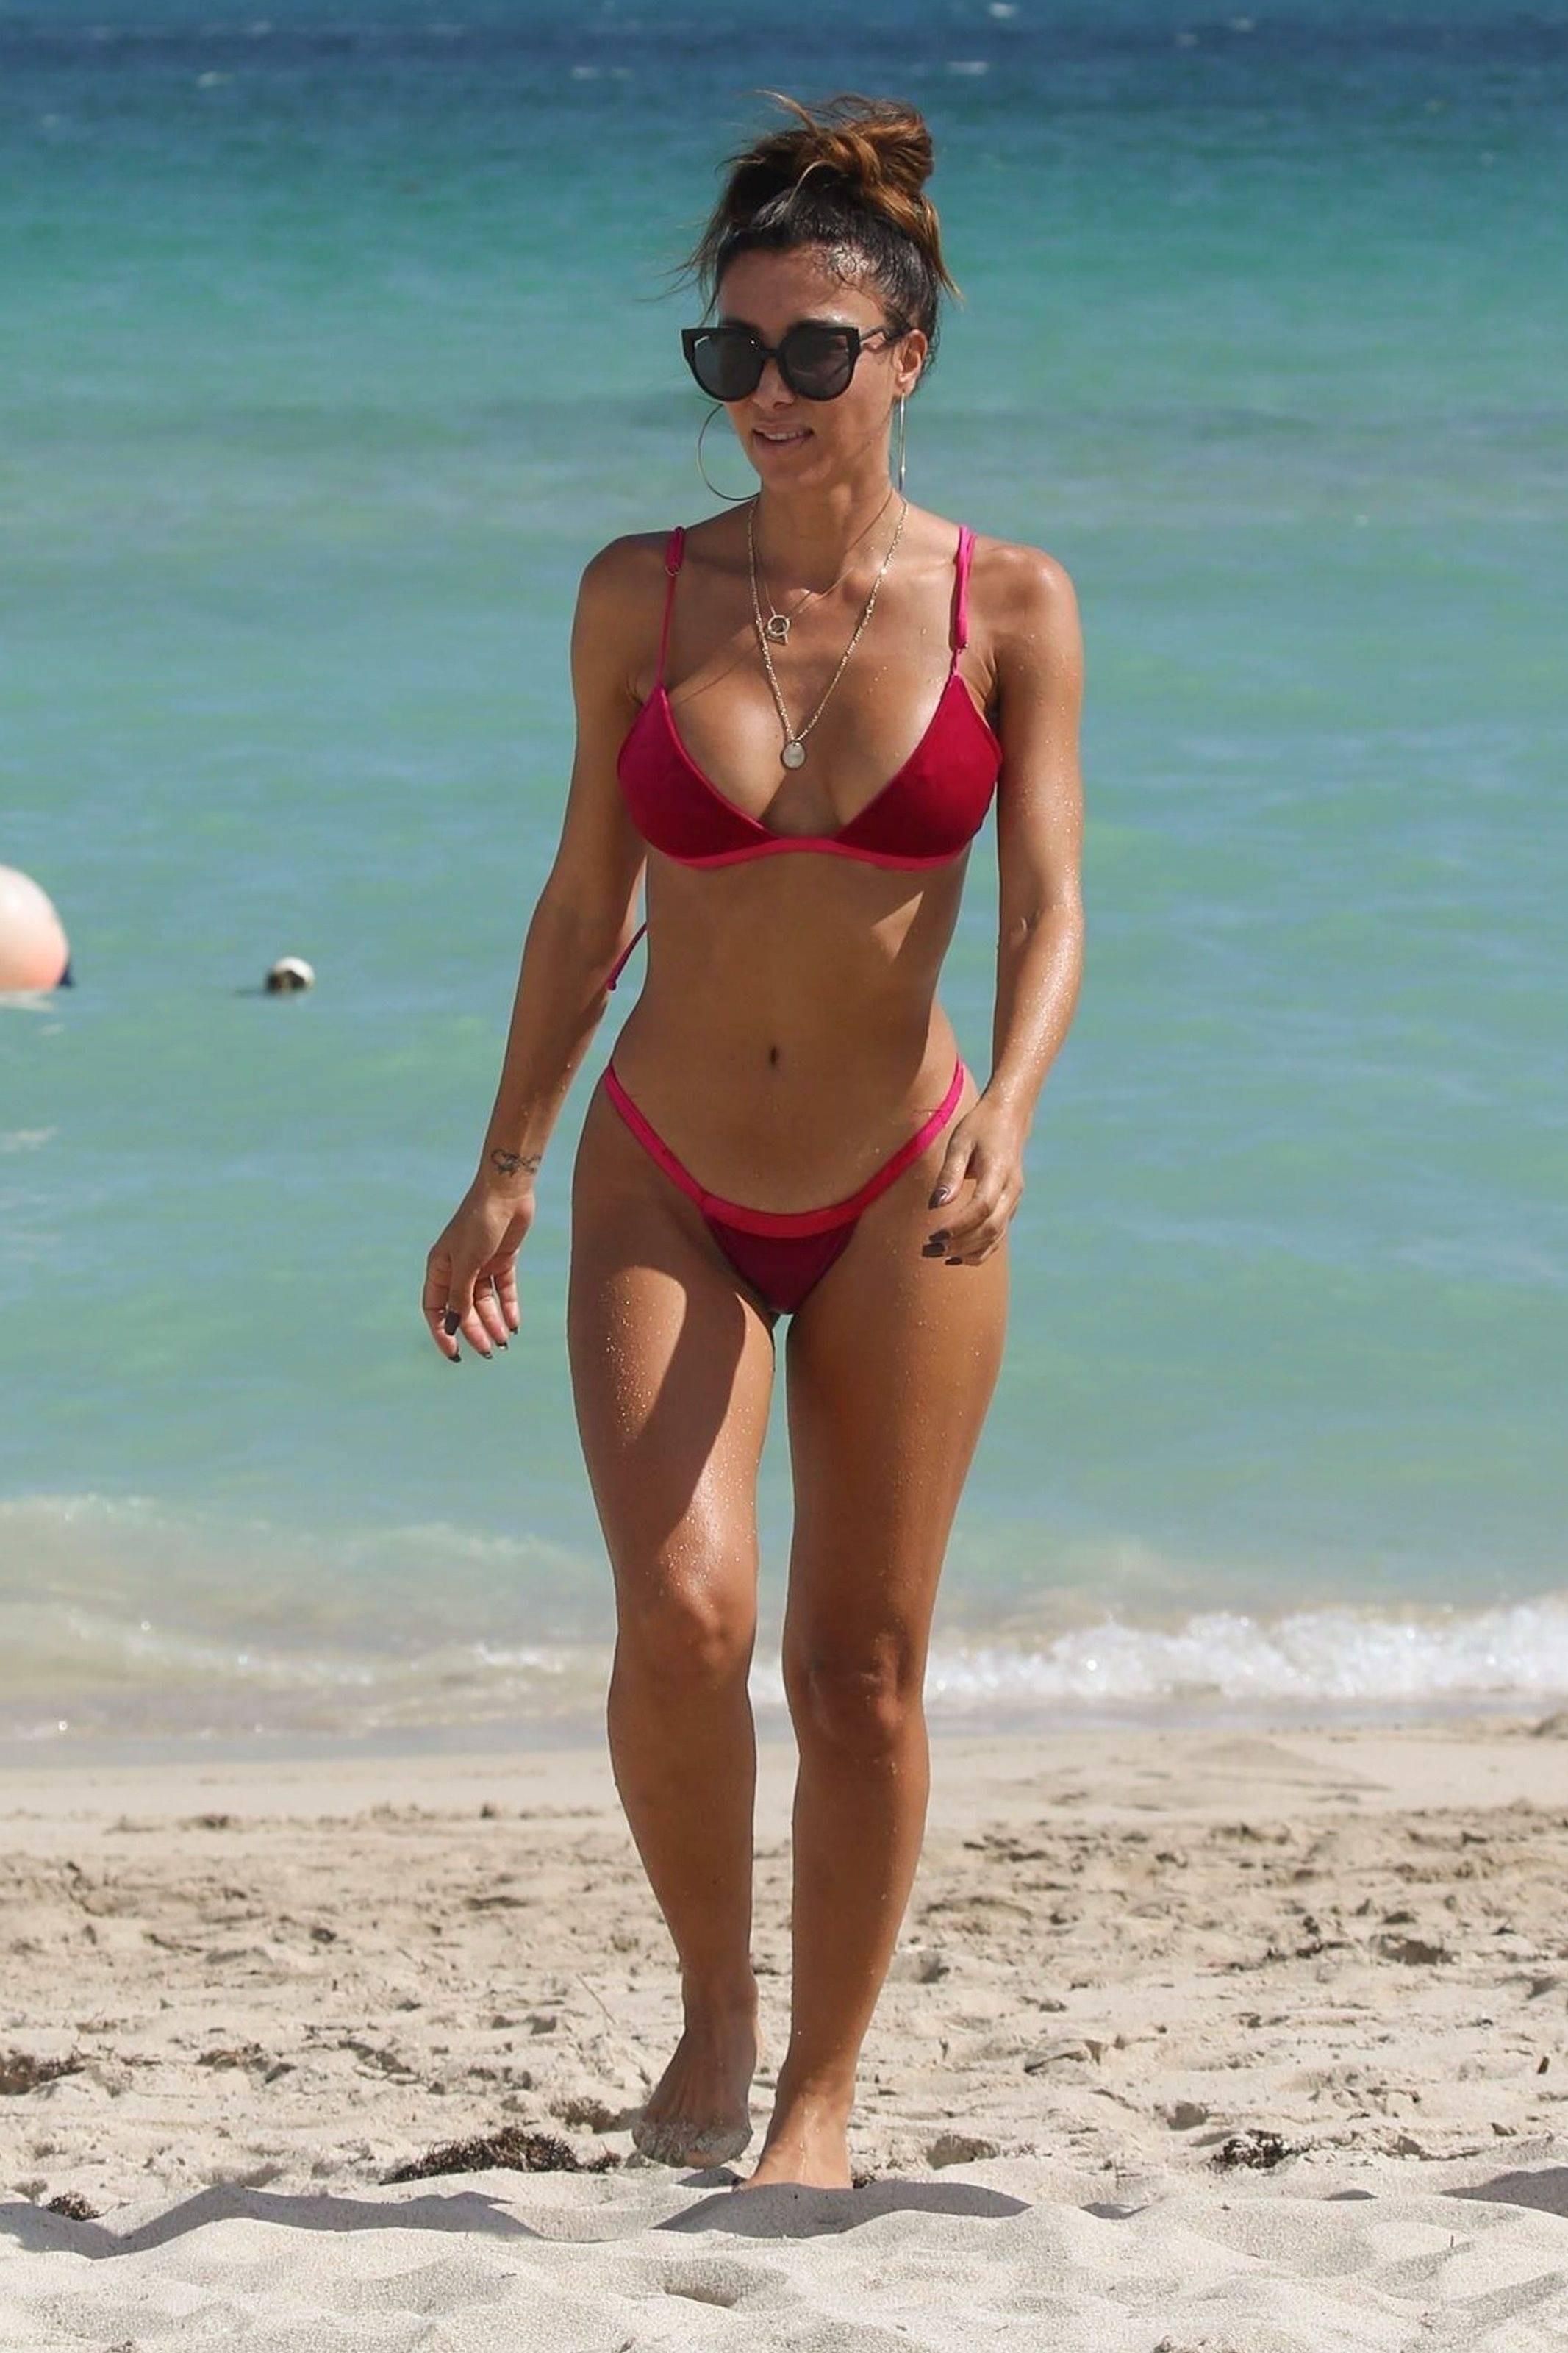 Metisha Schaefer Bikini Pictures, Big Tits